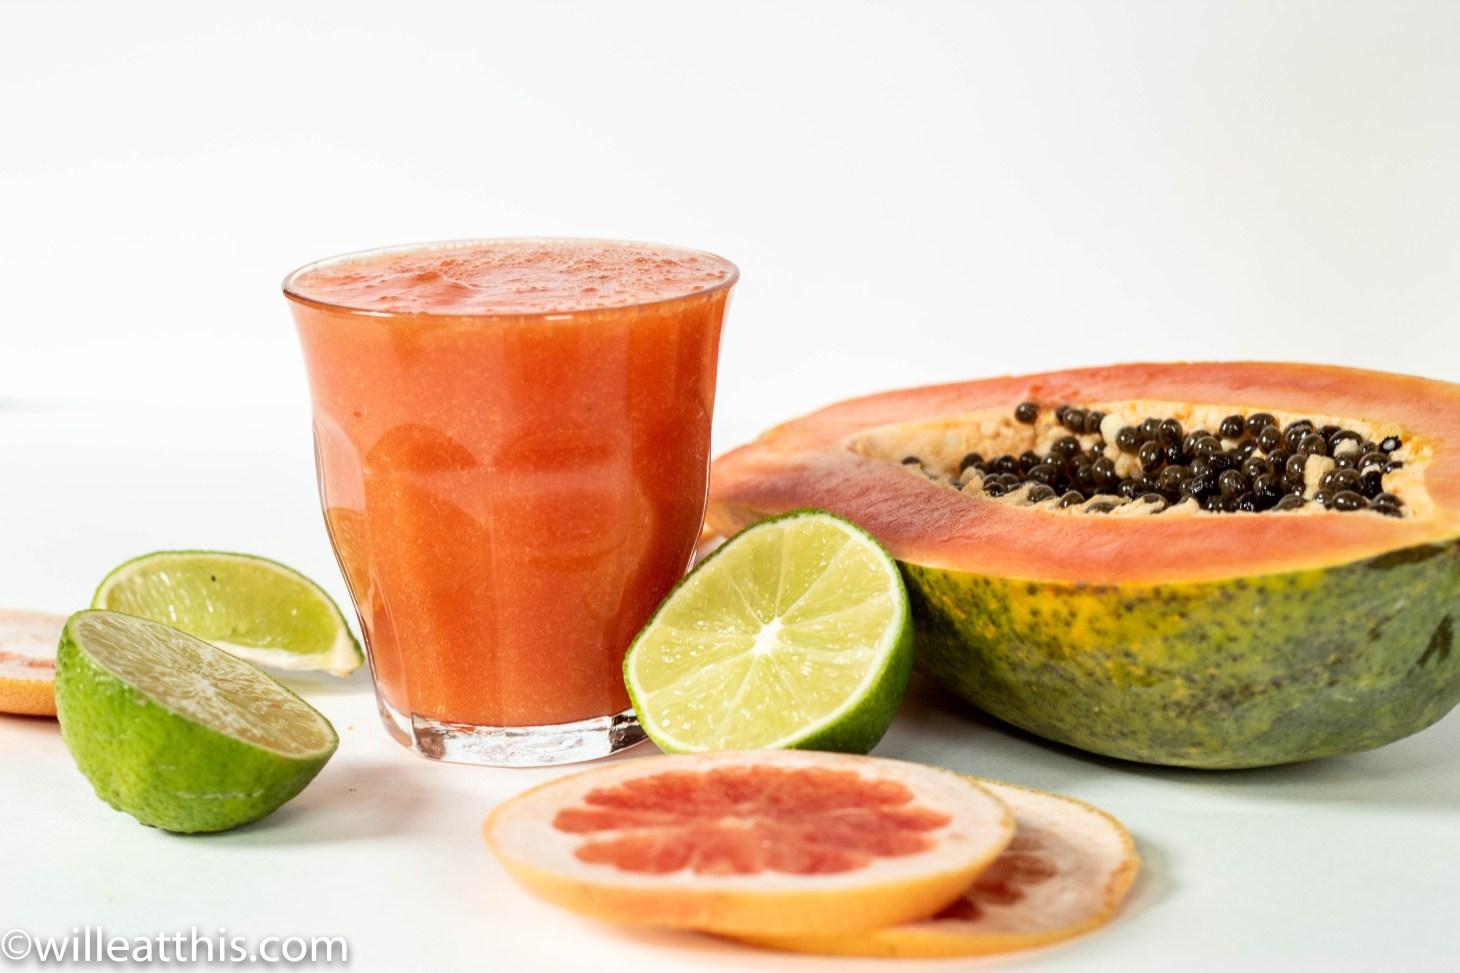 a glass of grapefruit papaya smoothie surrounded by cut citrus fruit and a half papaya